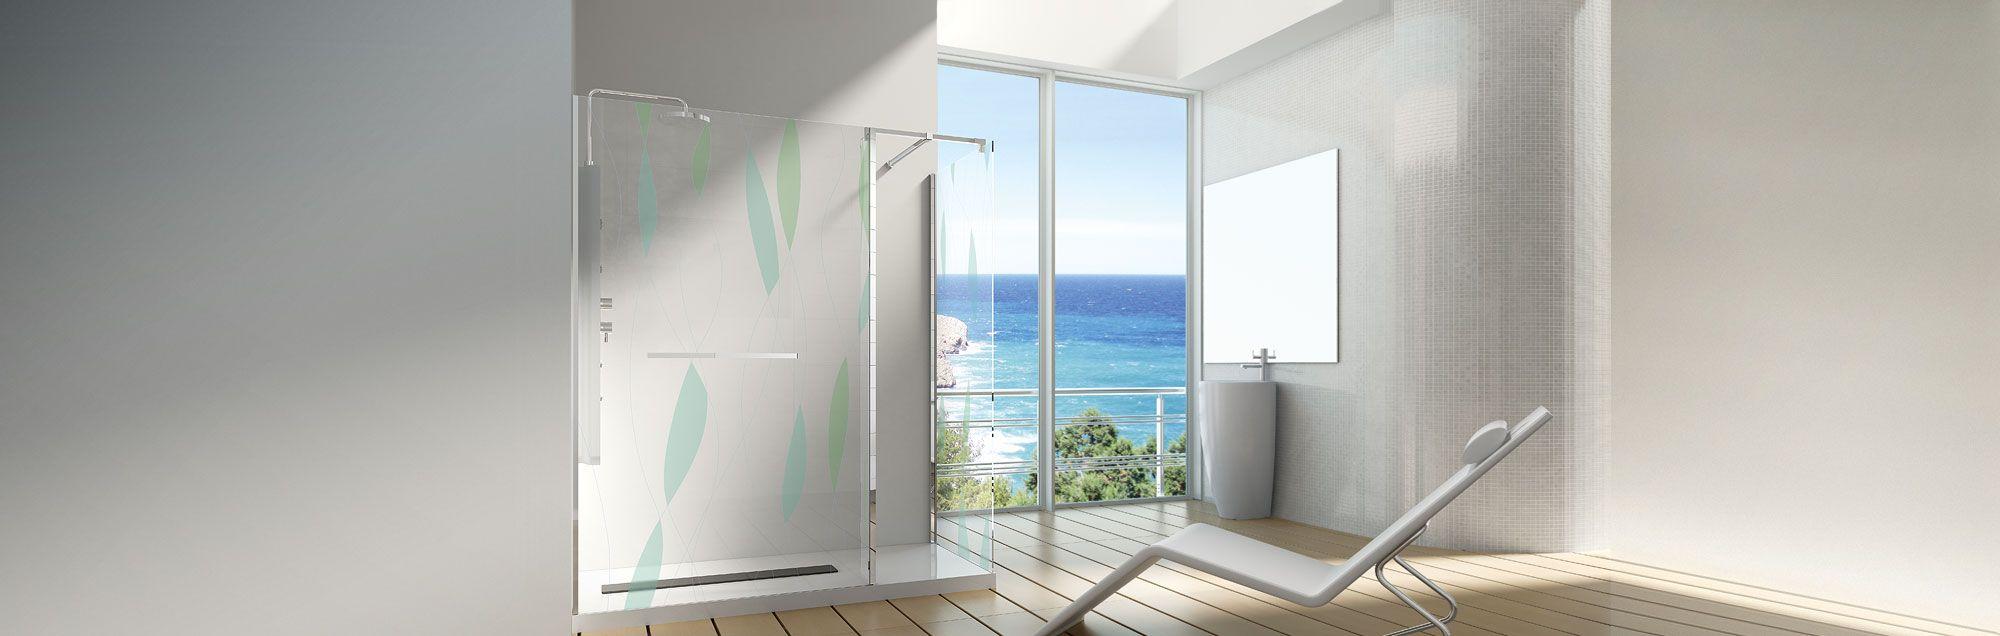 Serie Alhambra de mamparas walk-in de baño a medida